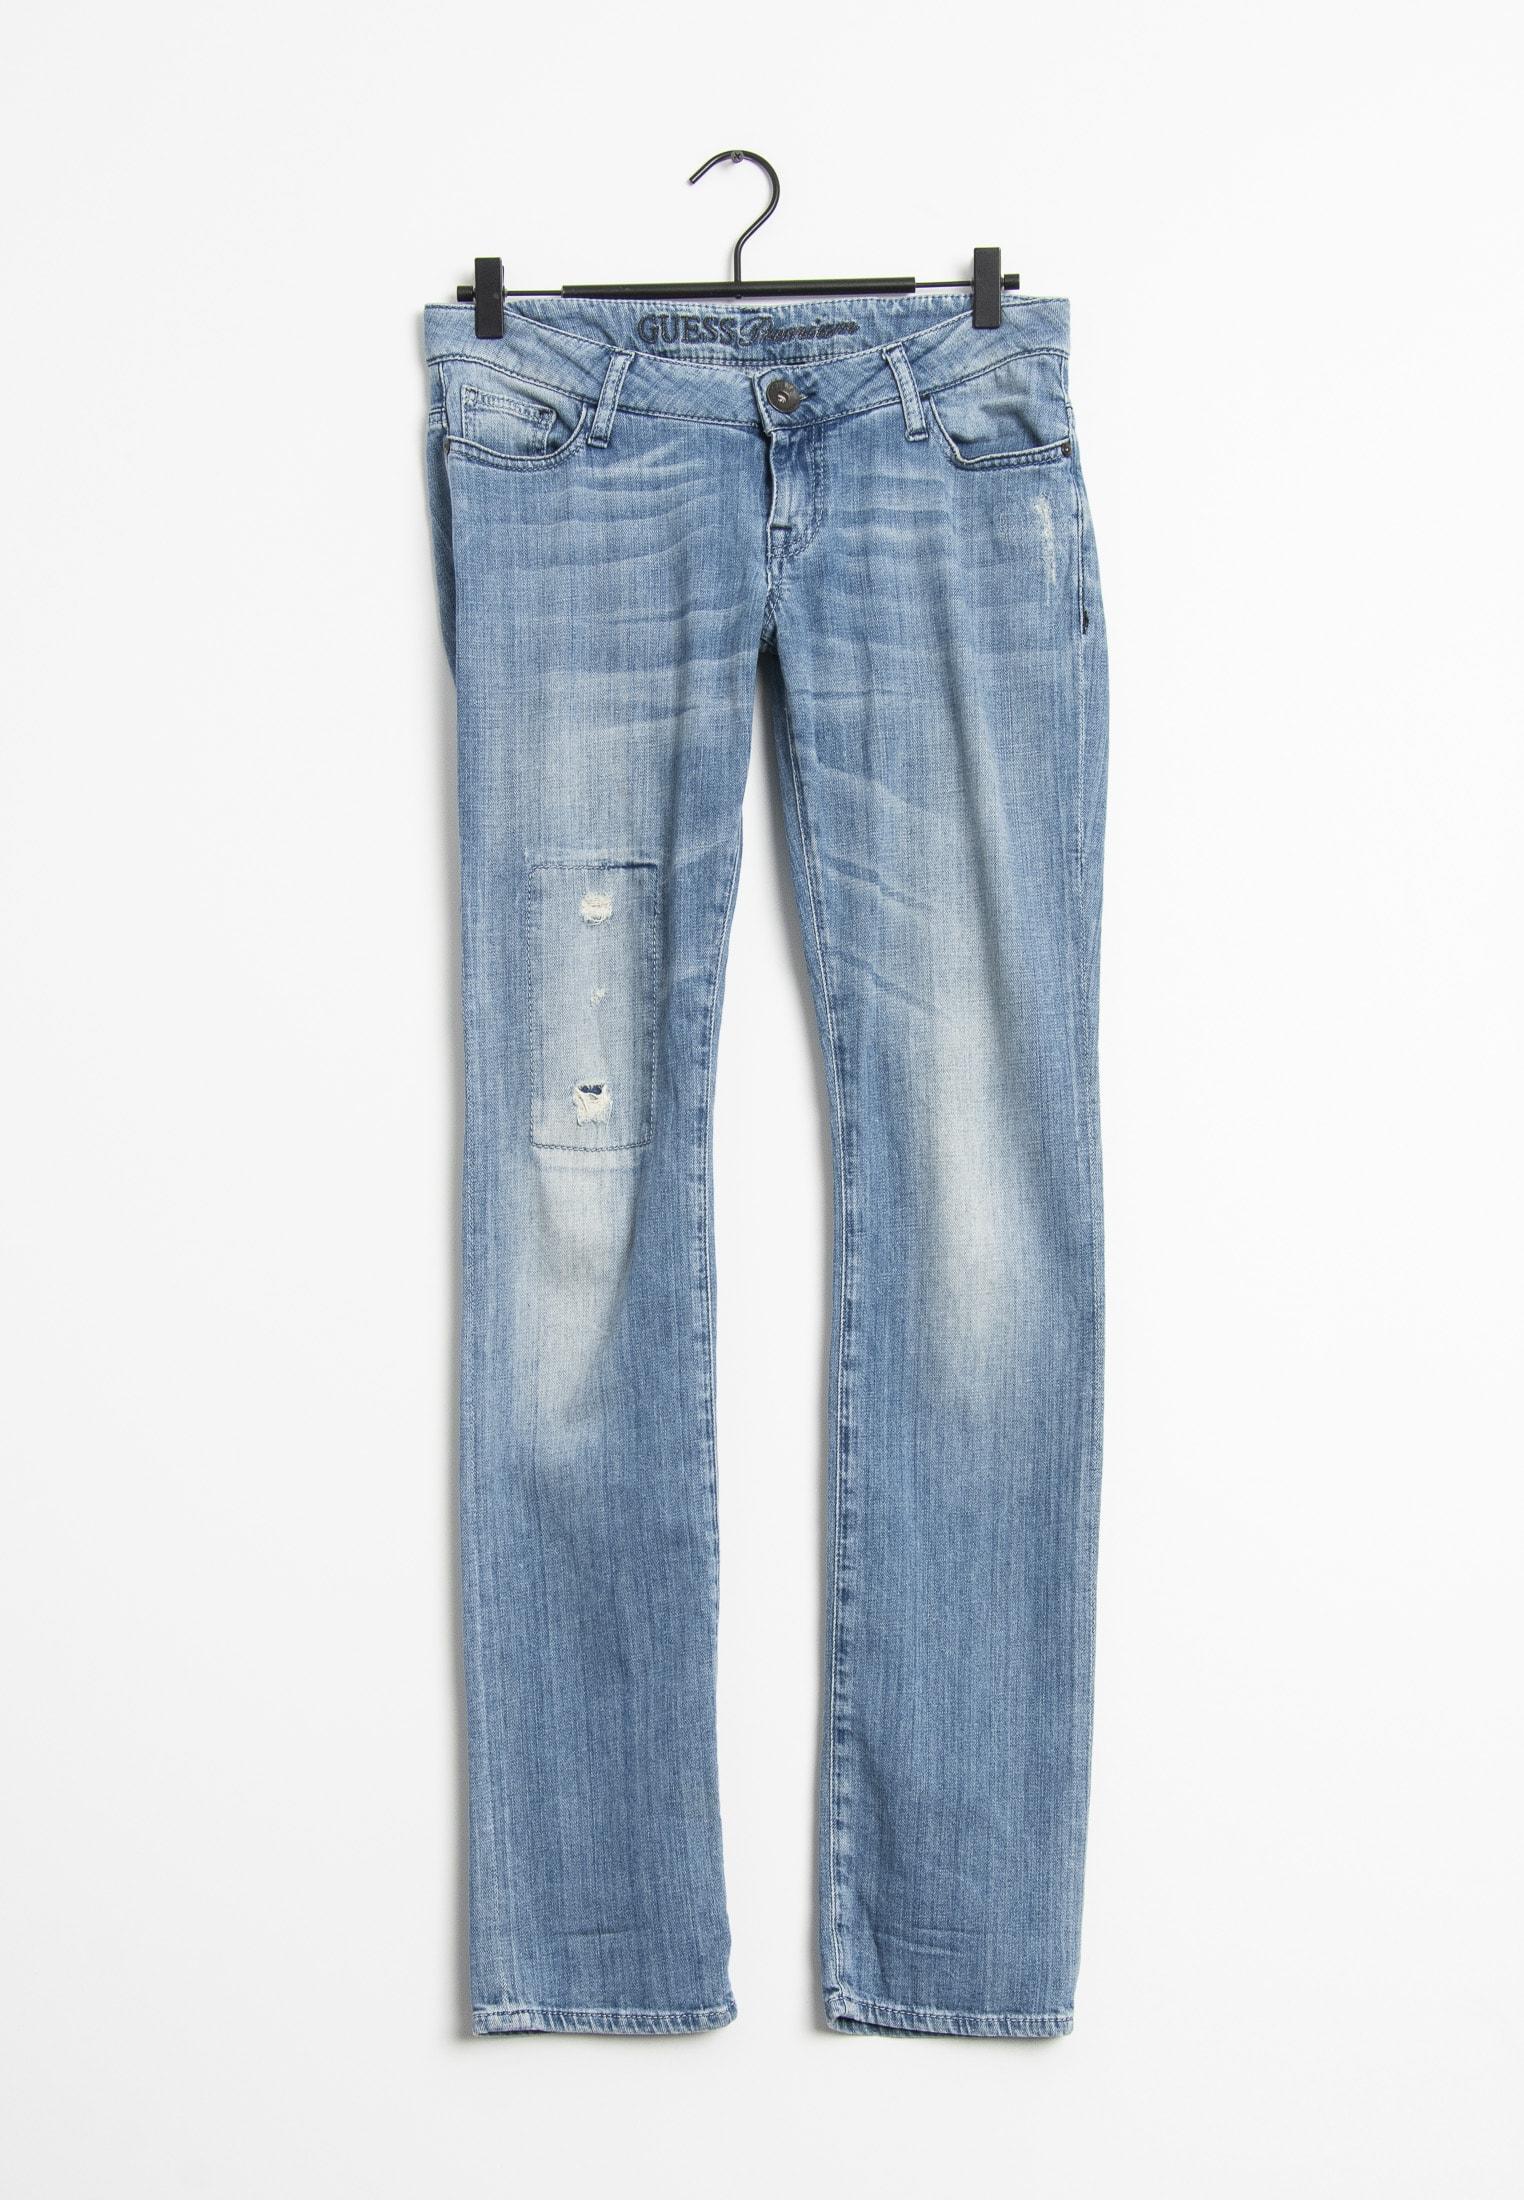 Guess Jeans Blau Gr.28